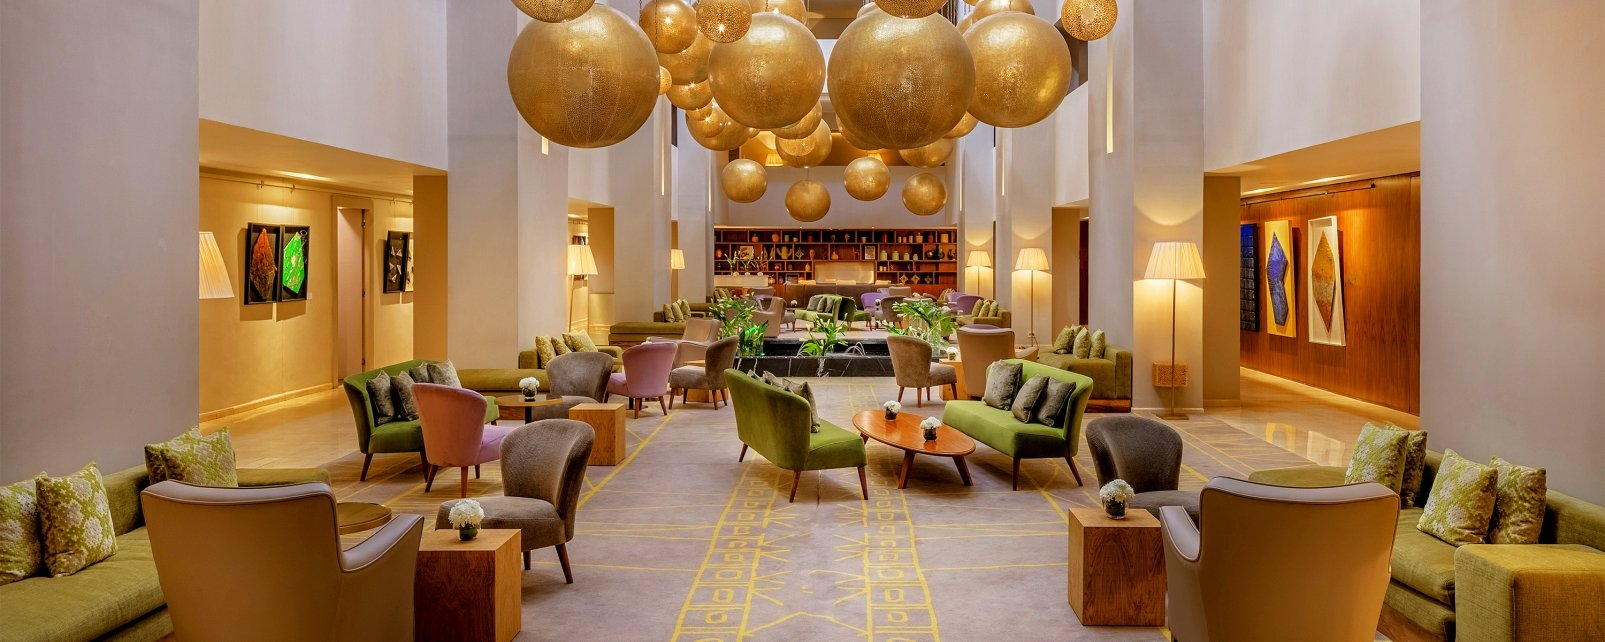 Hôtel Sofitel Marrakech Lounge and Spa